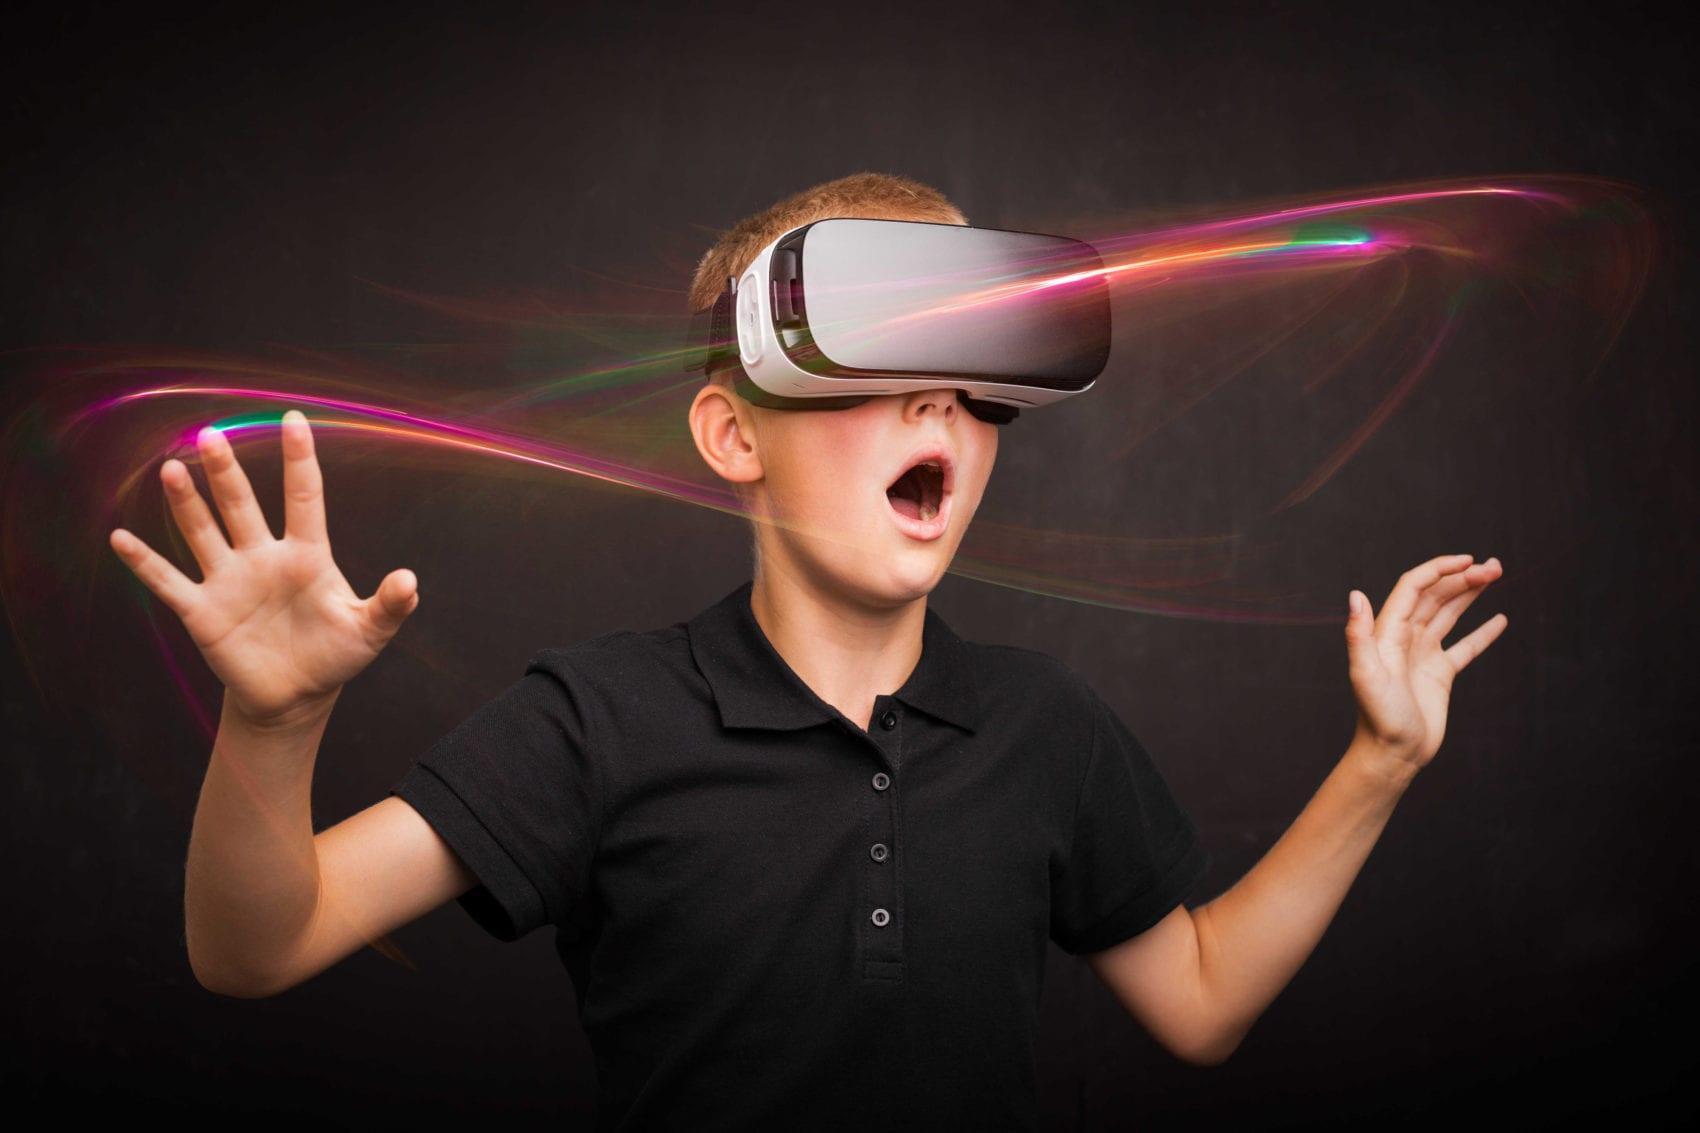 Lightroom studio VR